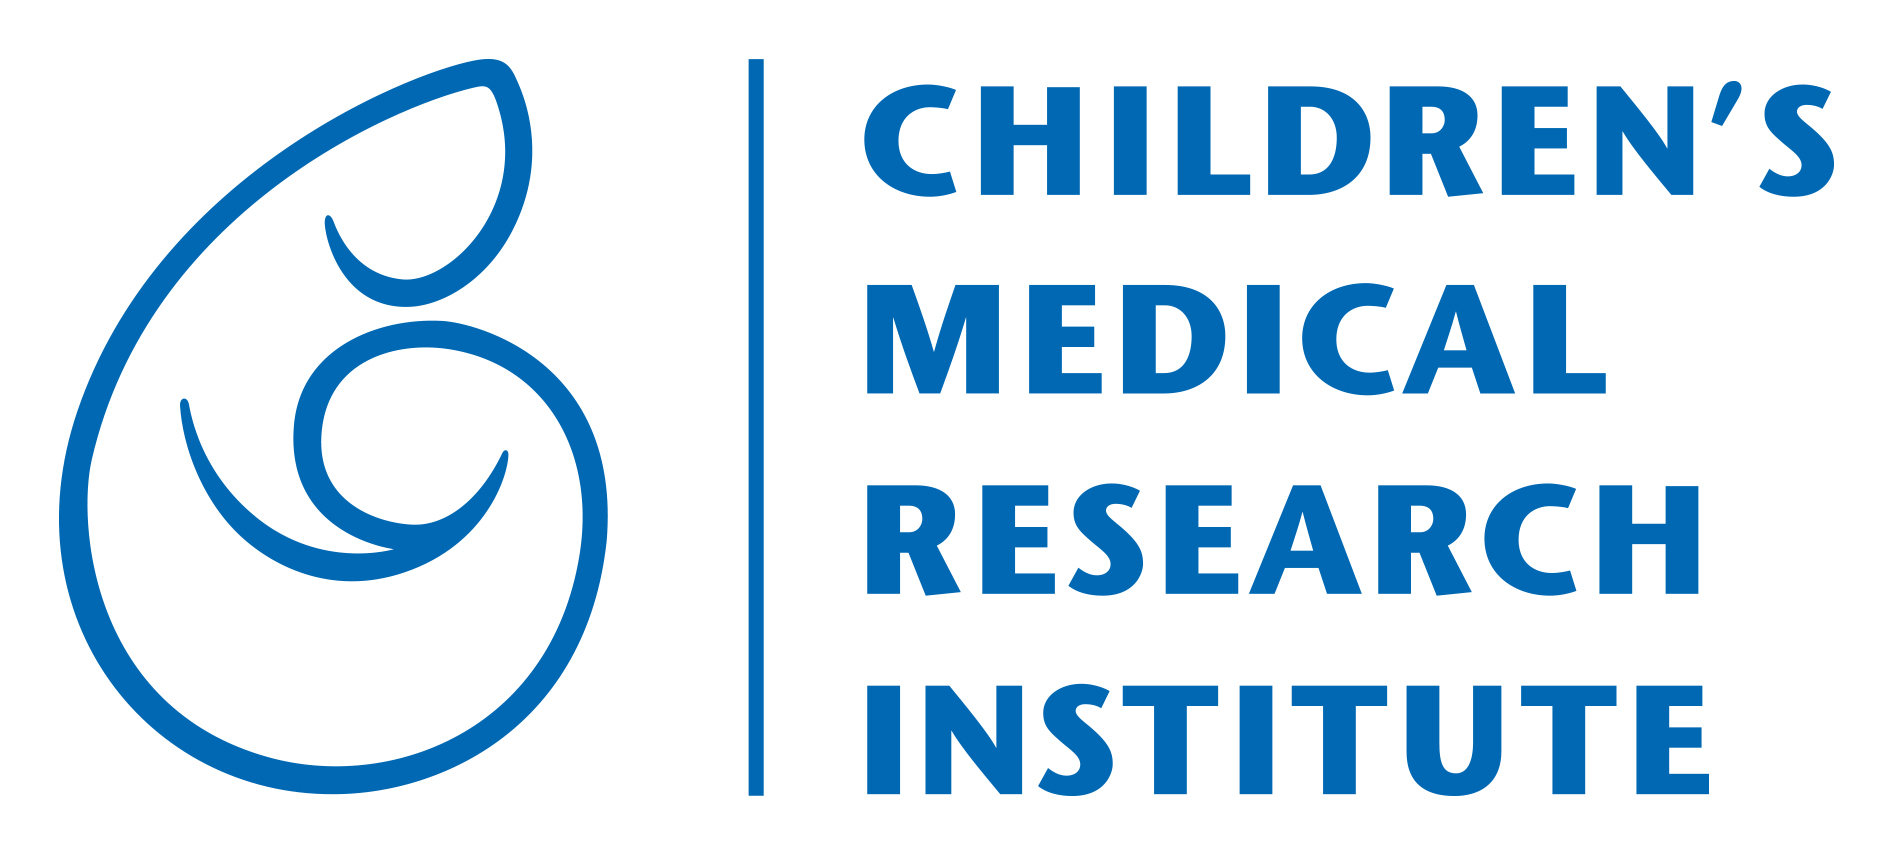 Children's Medical Research Institute logo